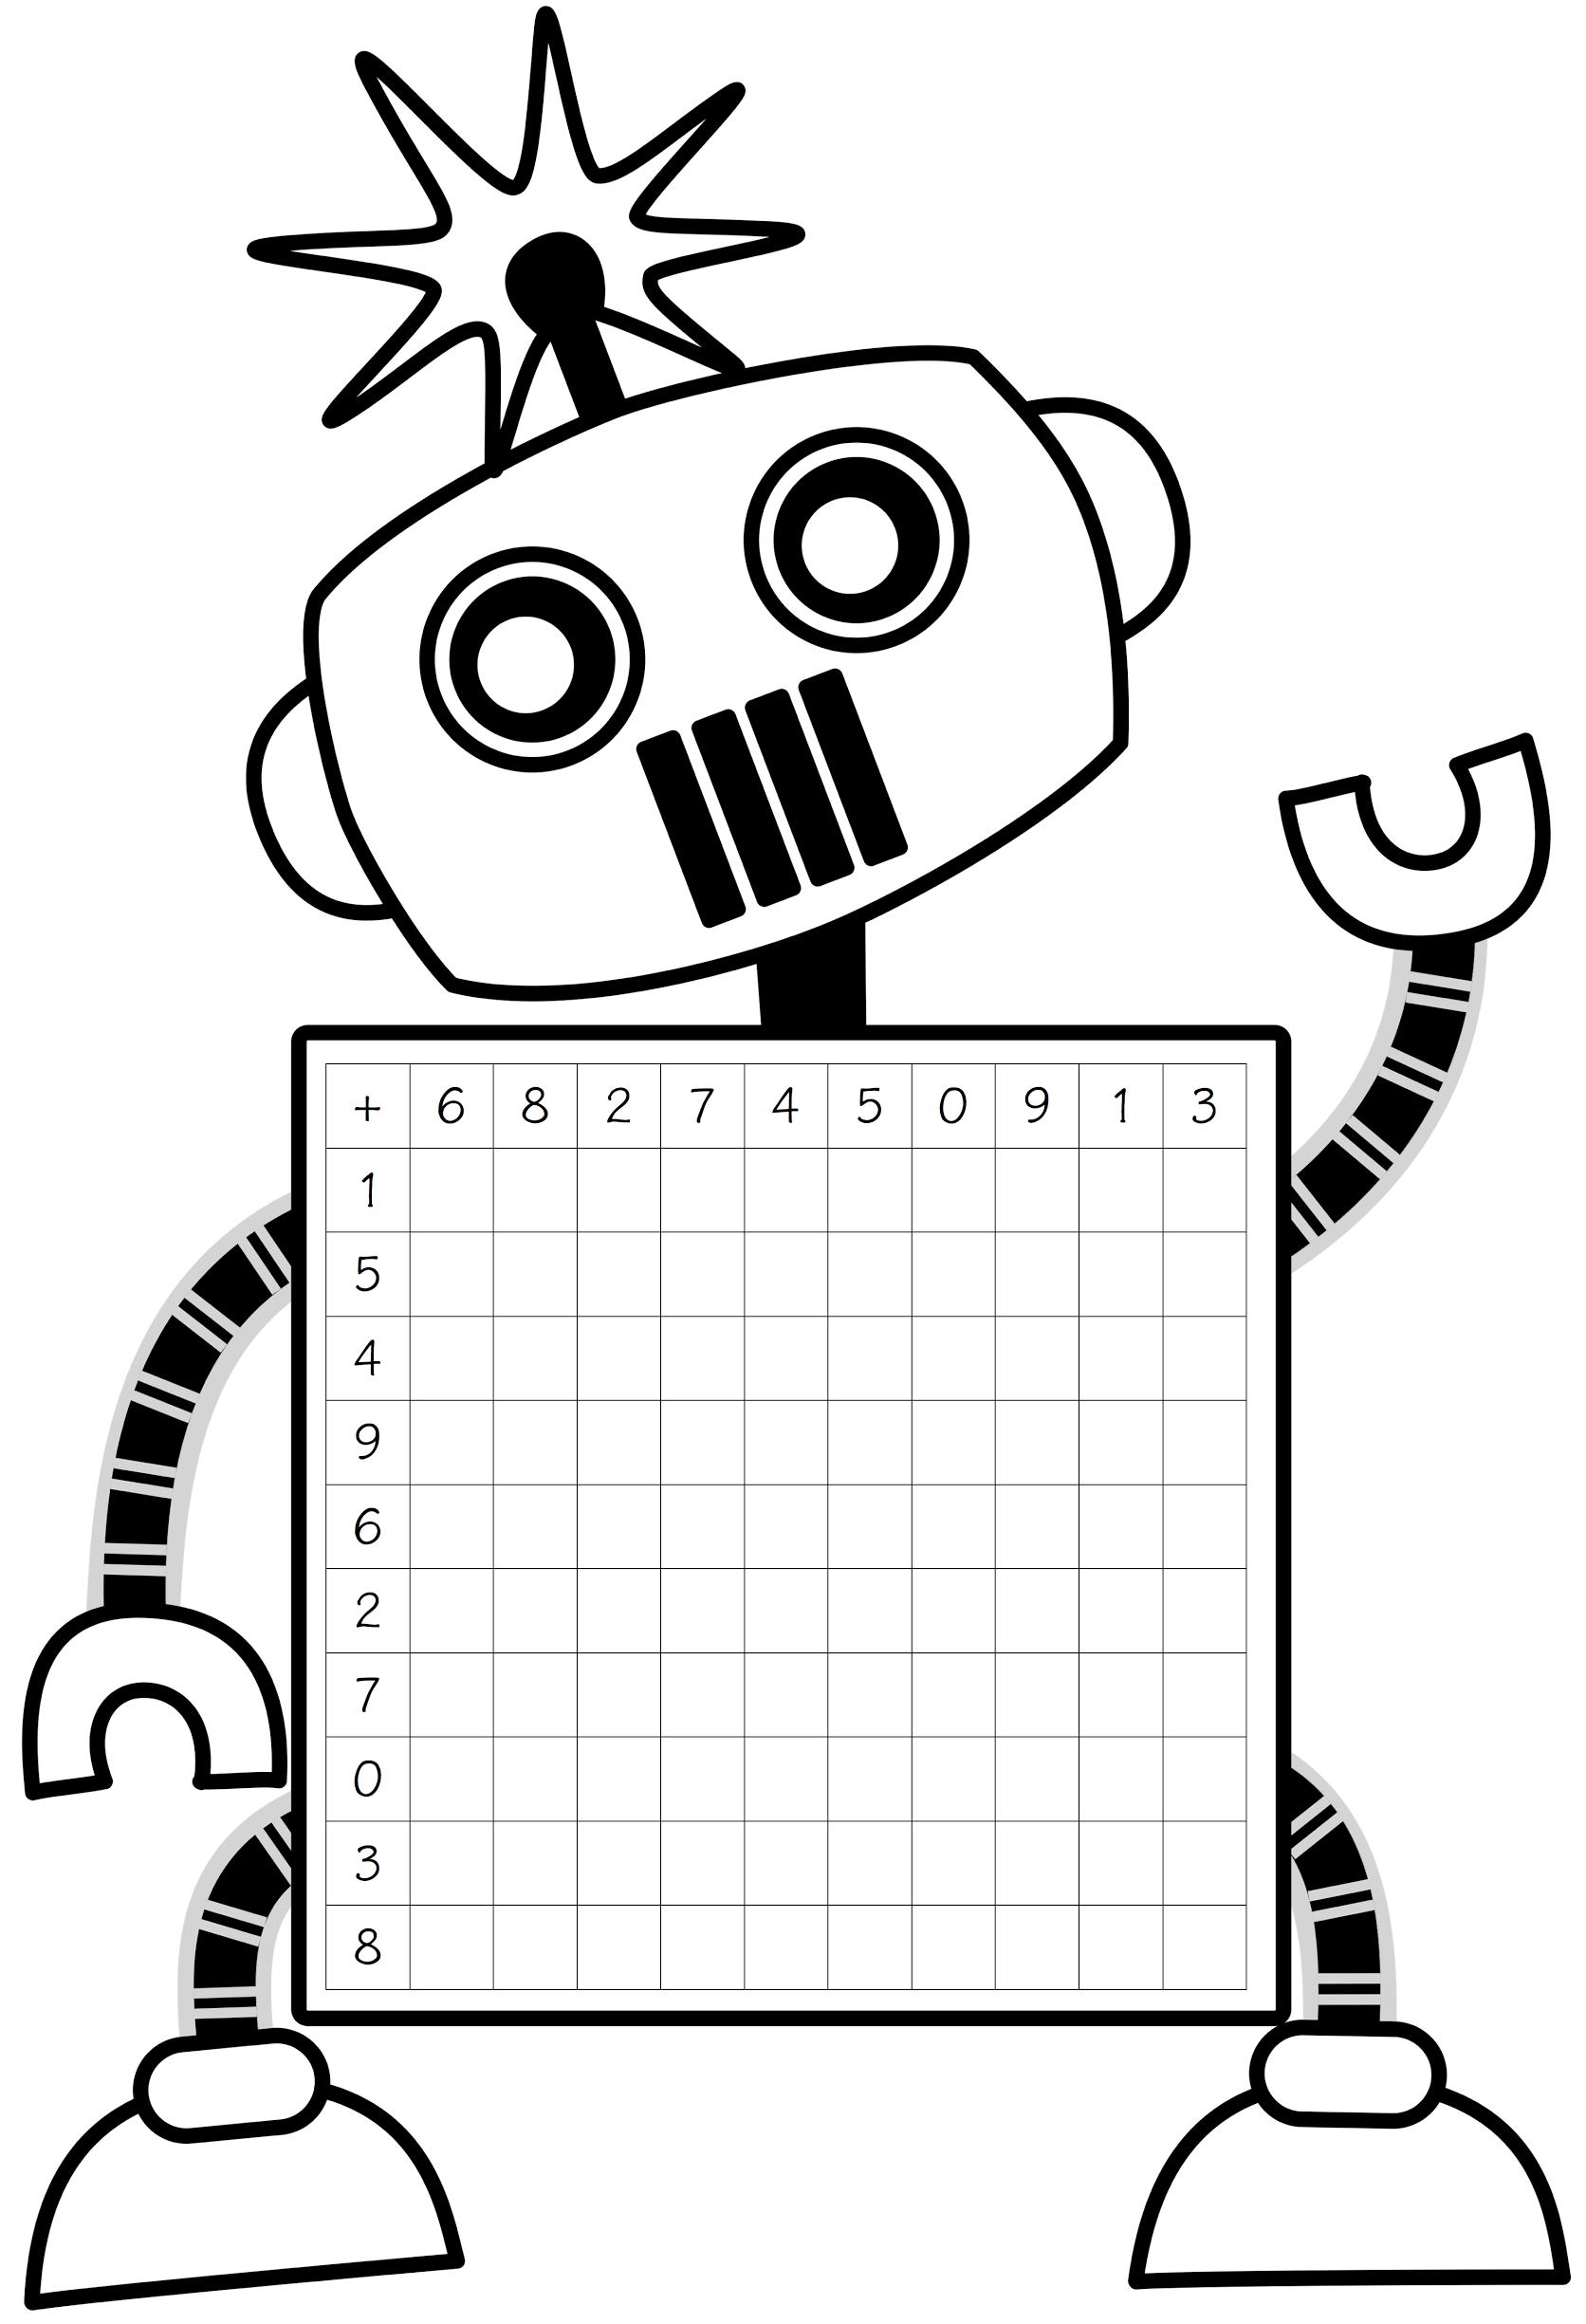 Displaying Robot Addition Grid